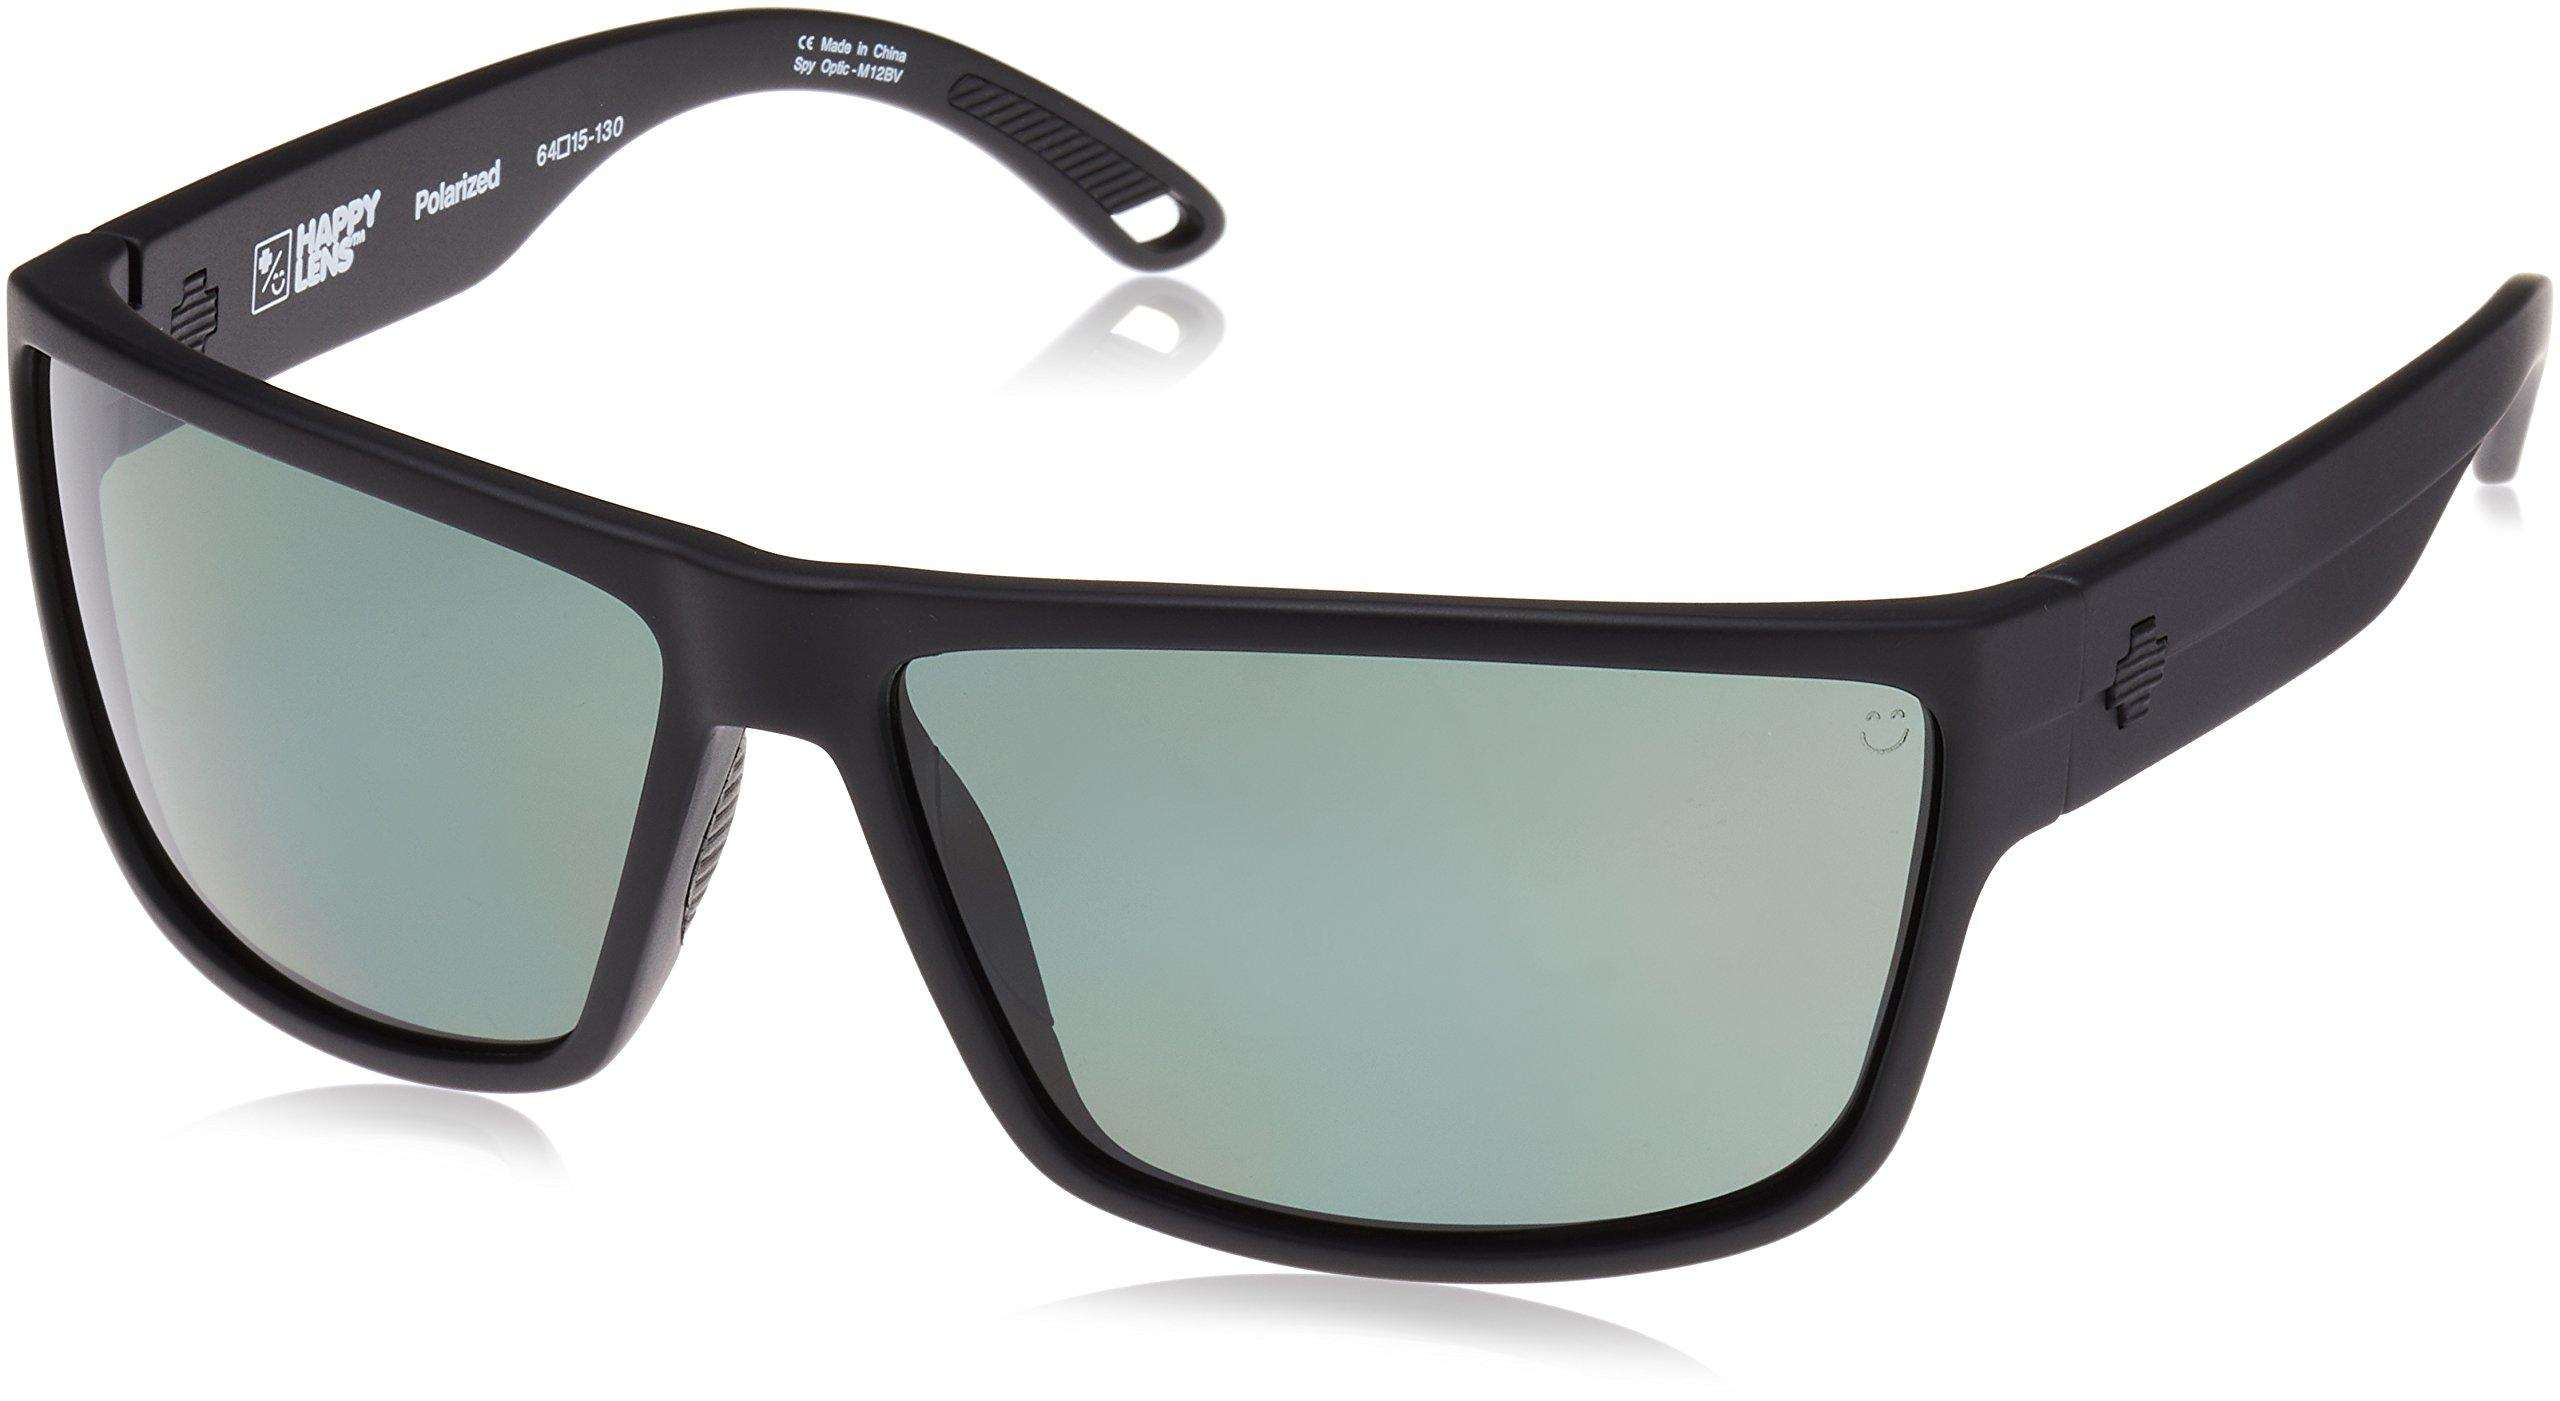 Spy Optic Rocky Flat Sunglasses, Matte Black/Happy Gray/Green Polar, 64 mm